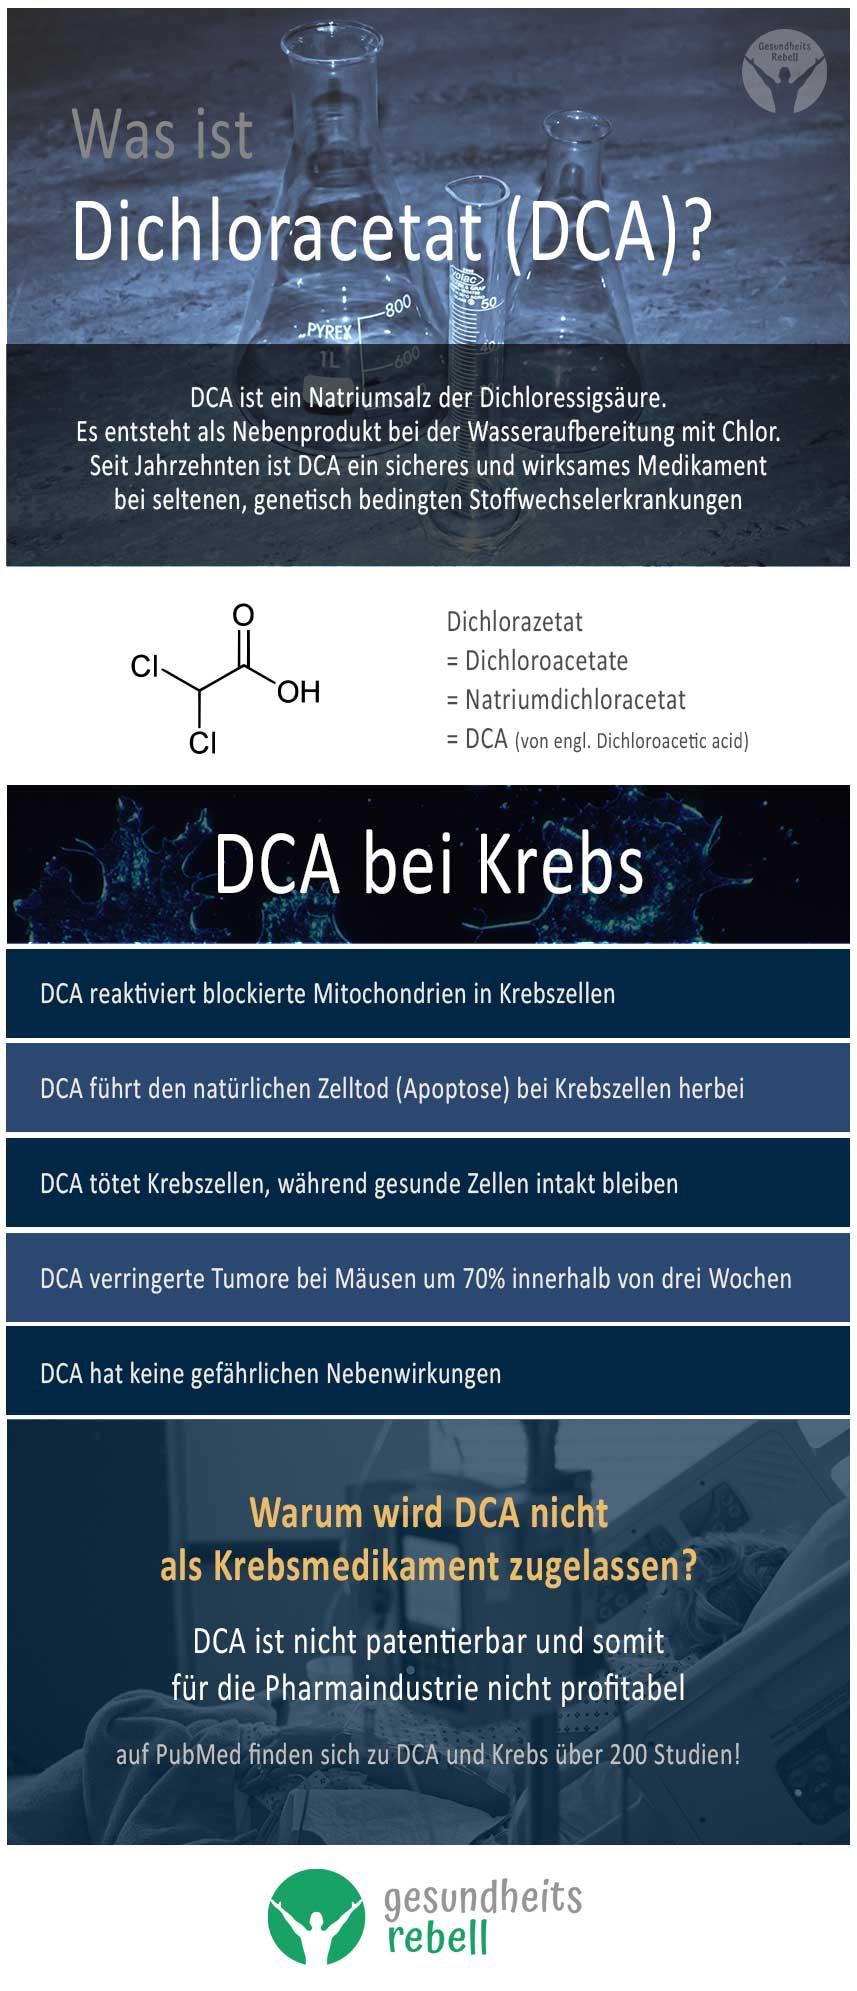 Dichloracetat (DCA) bei Krebs